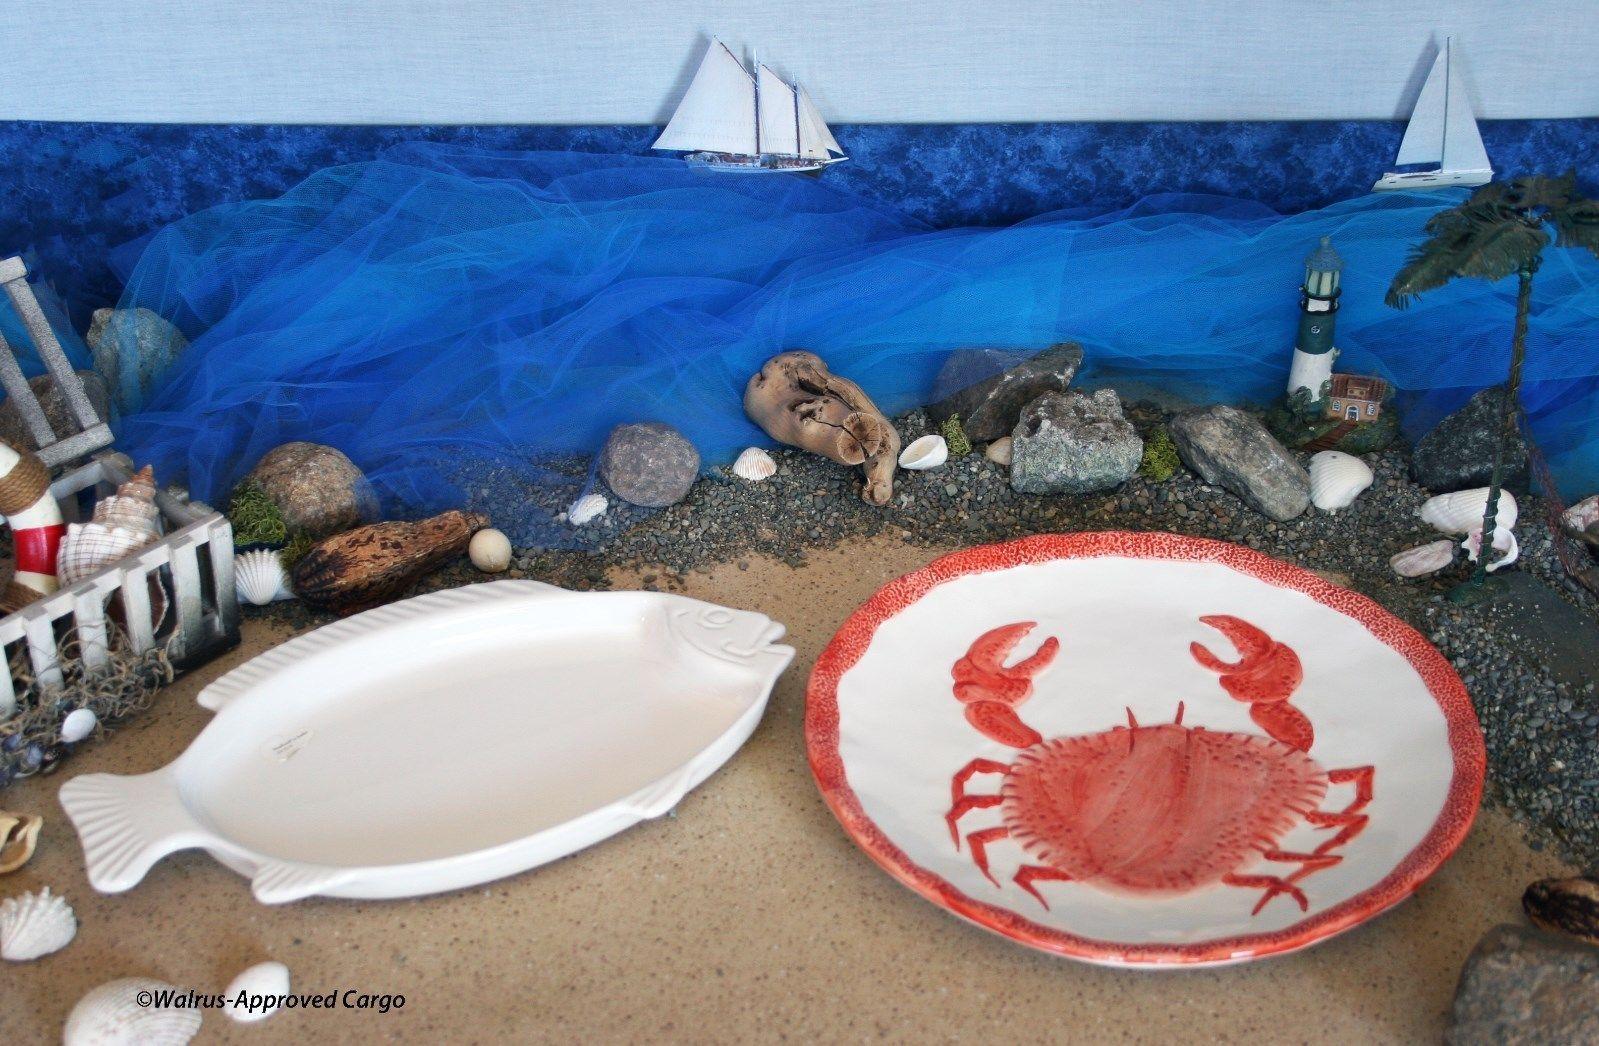 Pfaltzgraff Seafood Bake N Server + Italian and 14 similar items